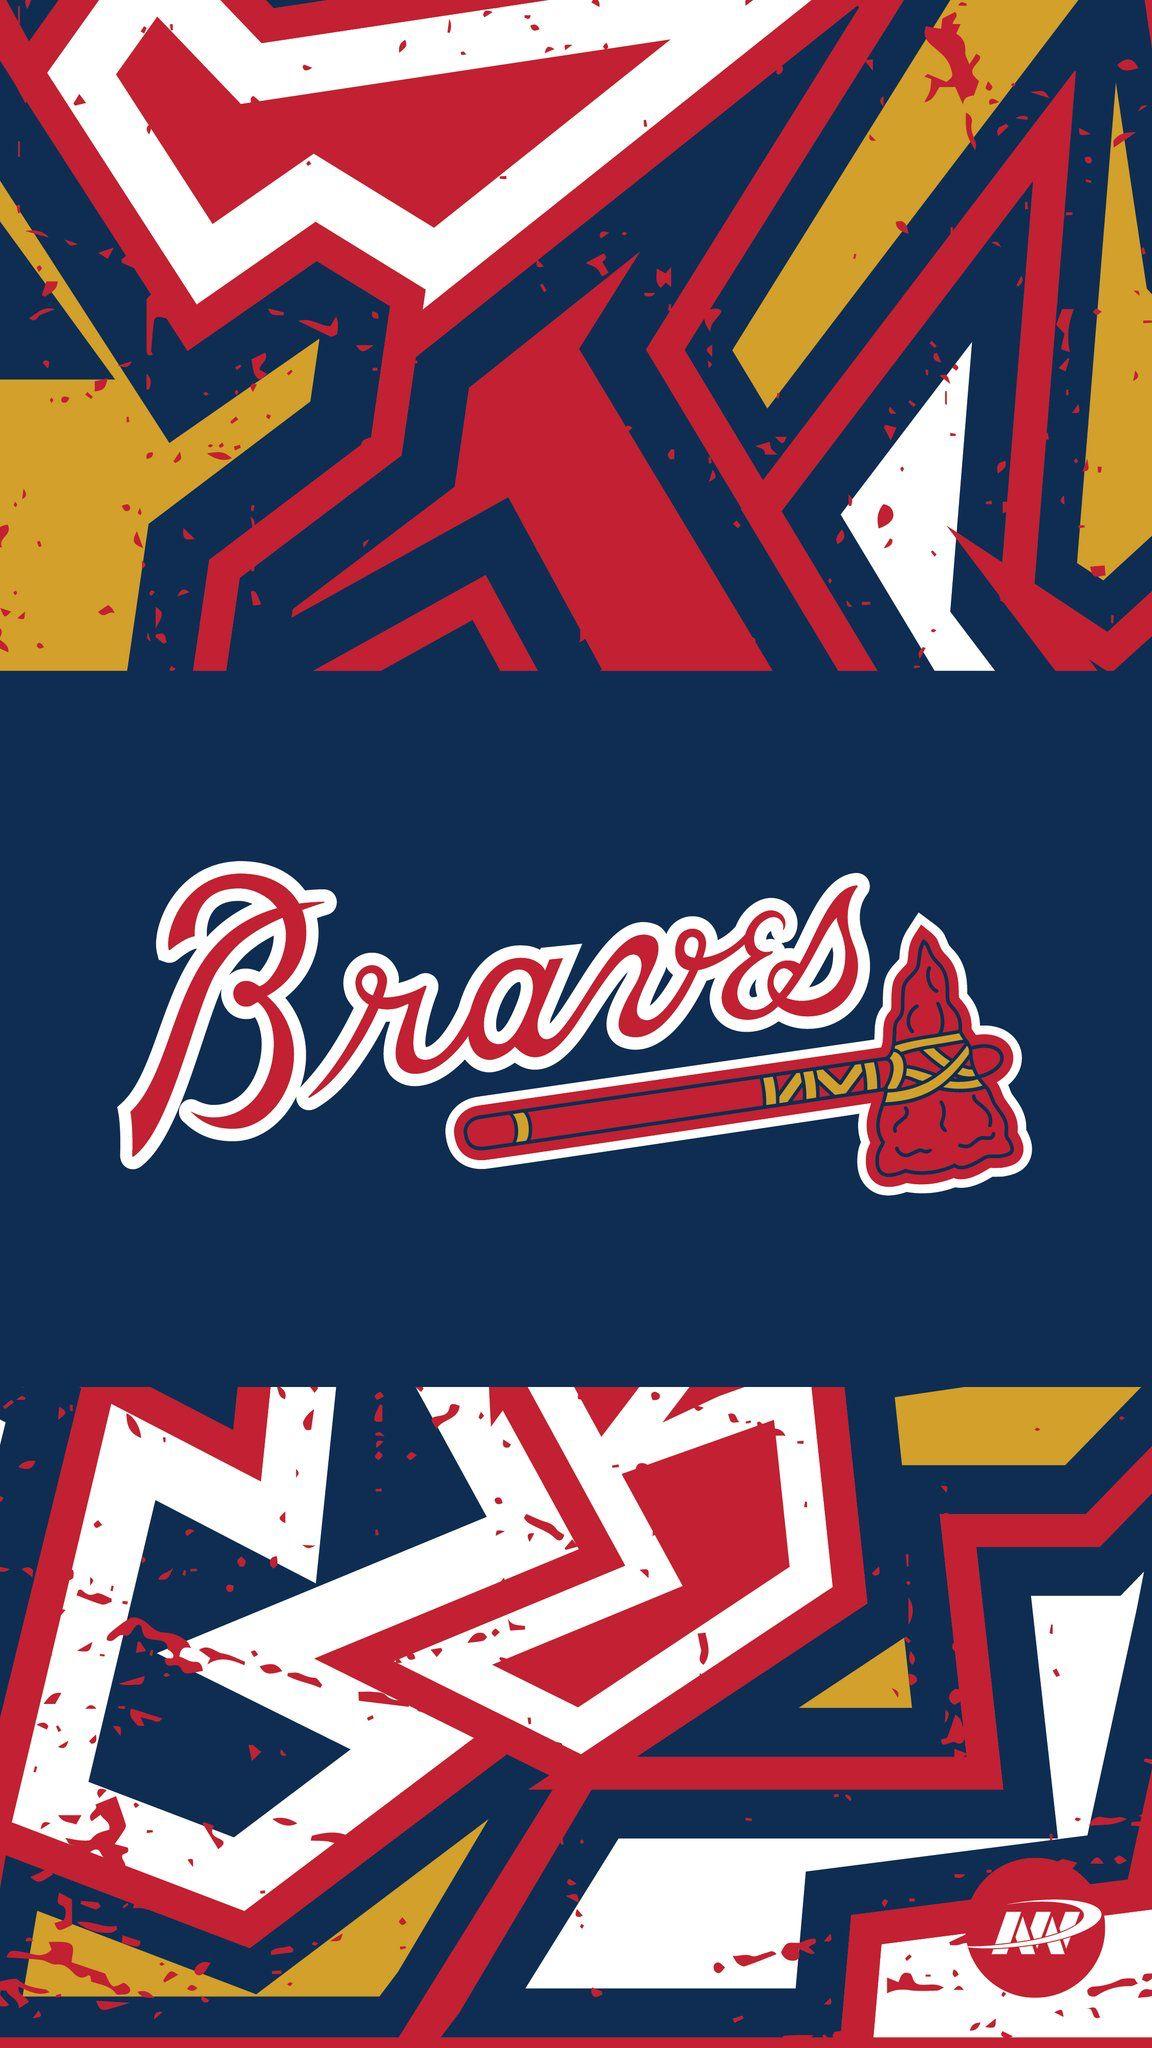 Pin By Nathaniel Guice On Sports City Atlanta Braves Wallpaper Atlanta Braves Iphone Wallpaper Atlanta Braves Logo